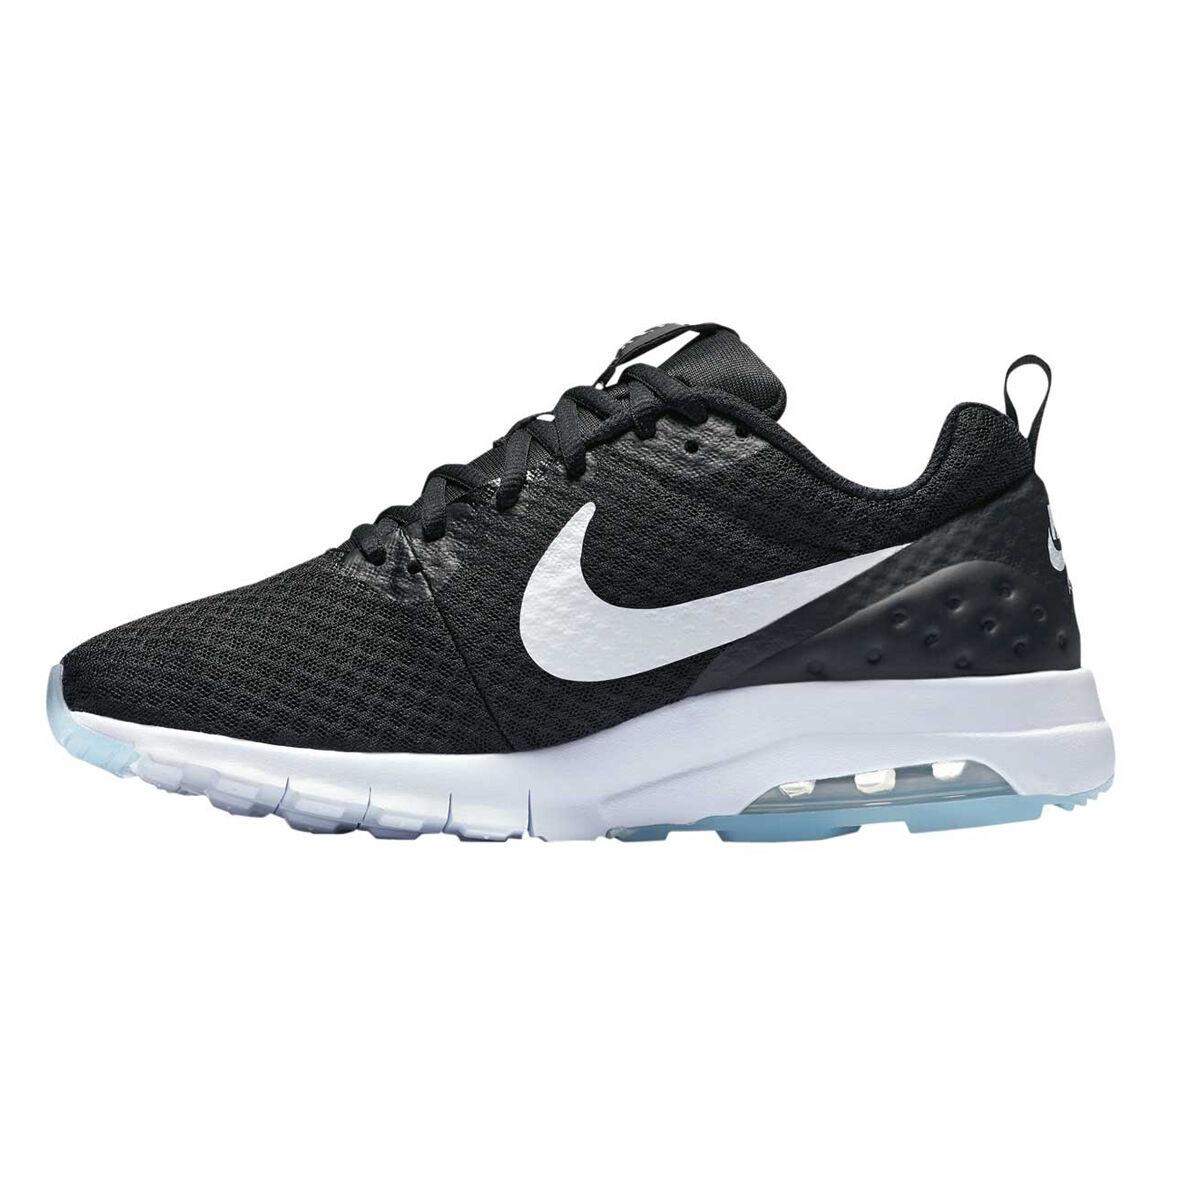 Nike Air Max Motion Womens Casual Shoes Black White US 6